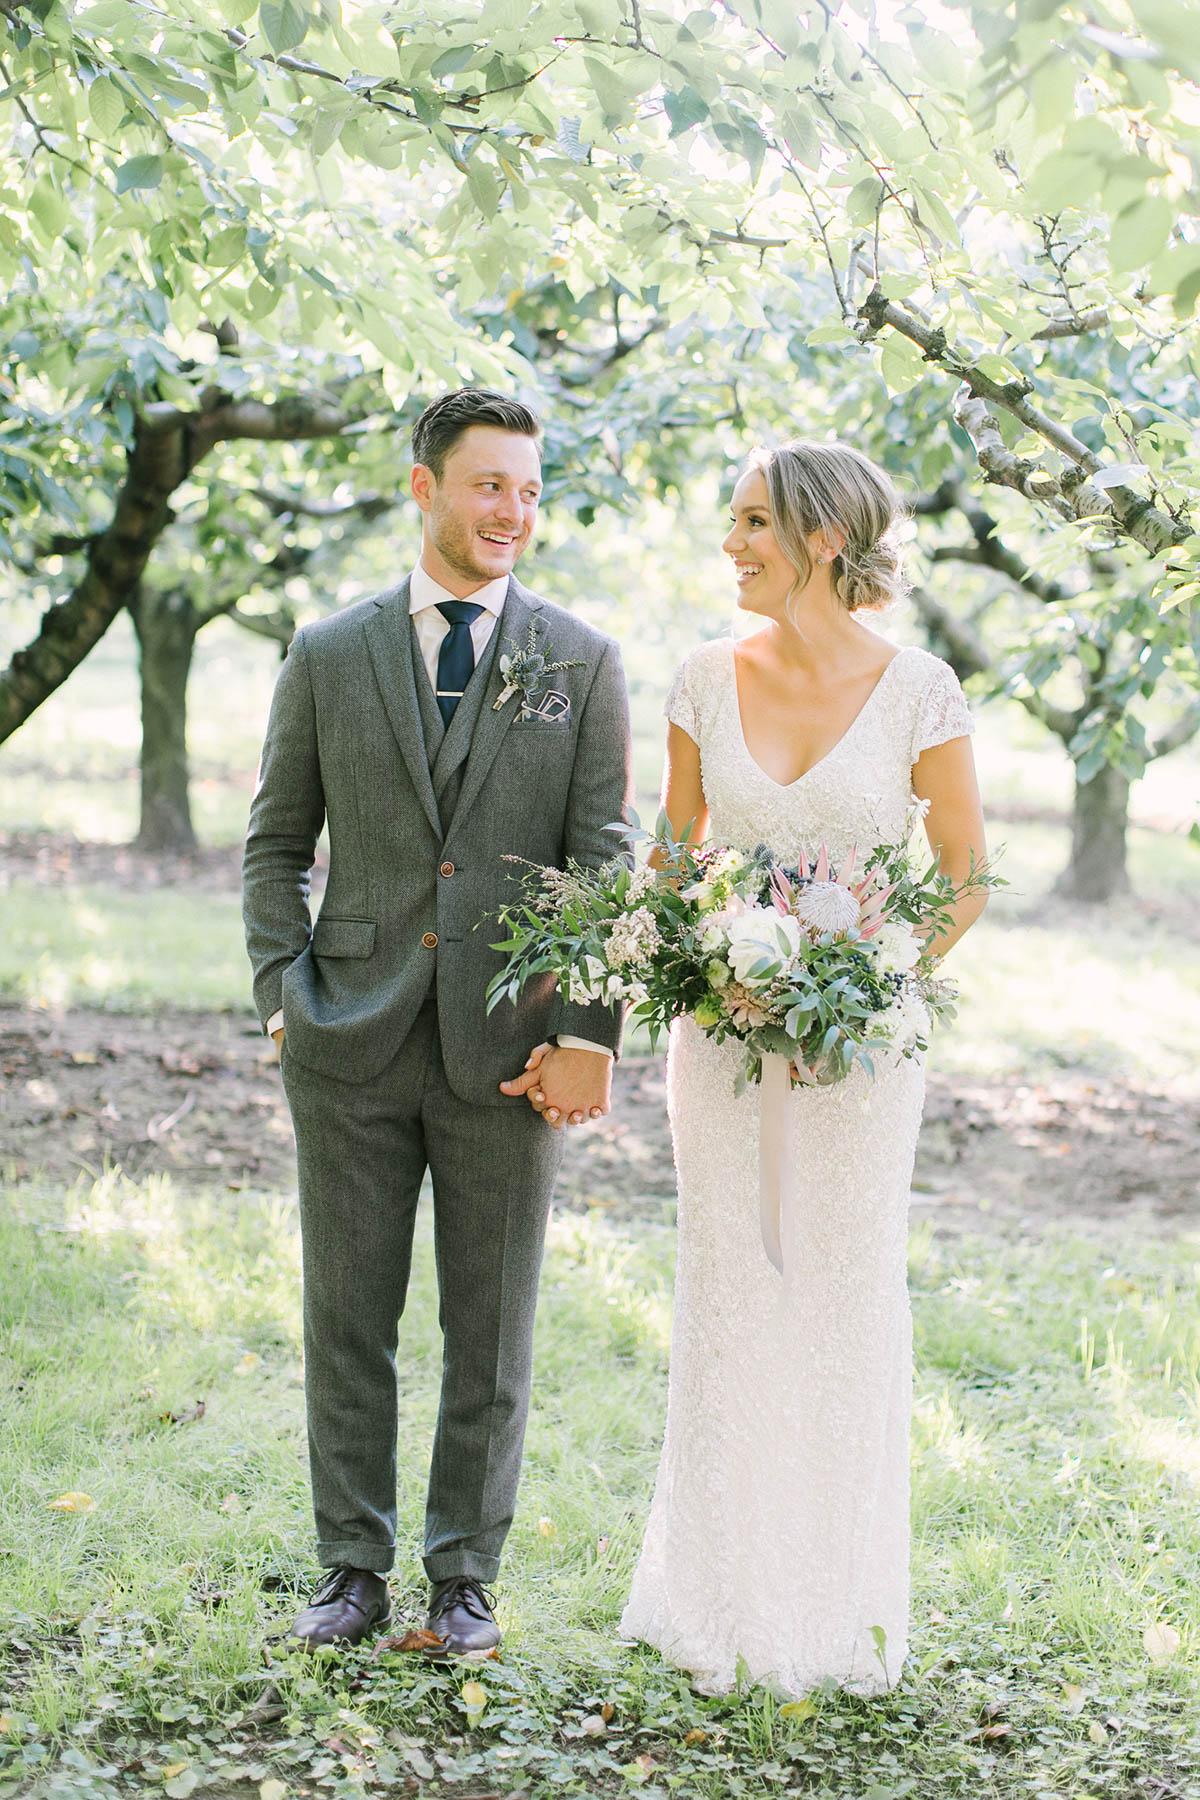 elizabeth-in-love-vineyard-bride-swish-list-cherry-avenue-farms-vineland-wedding-37.jpg